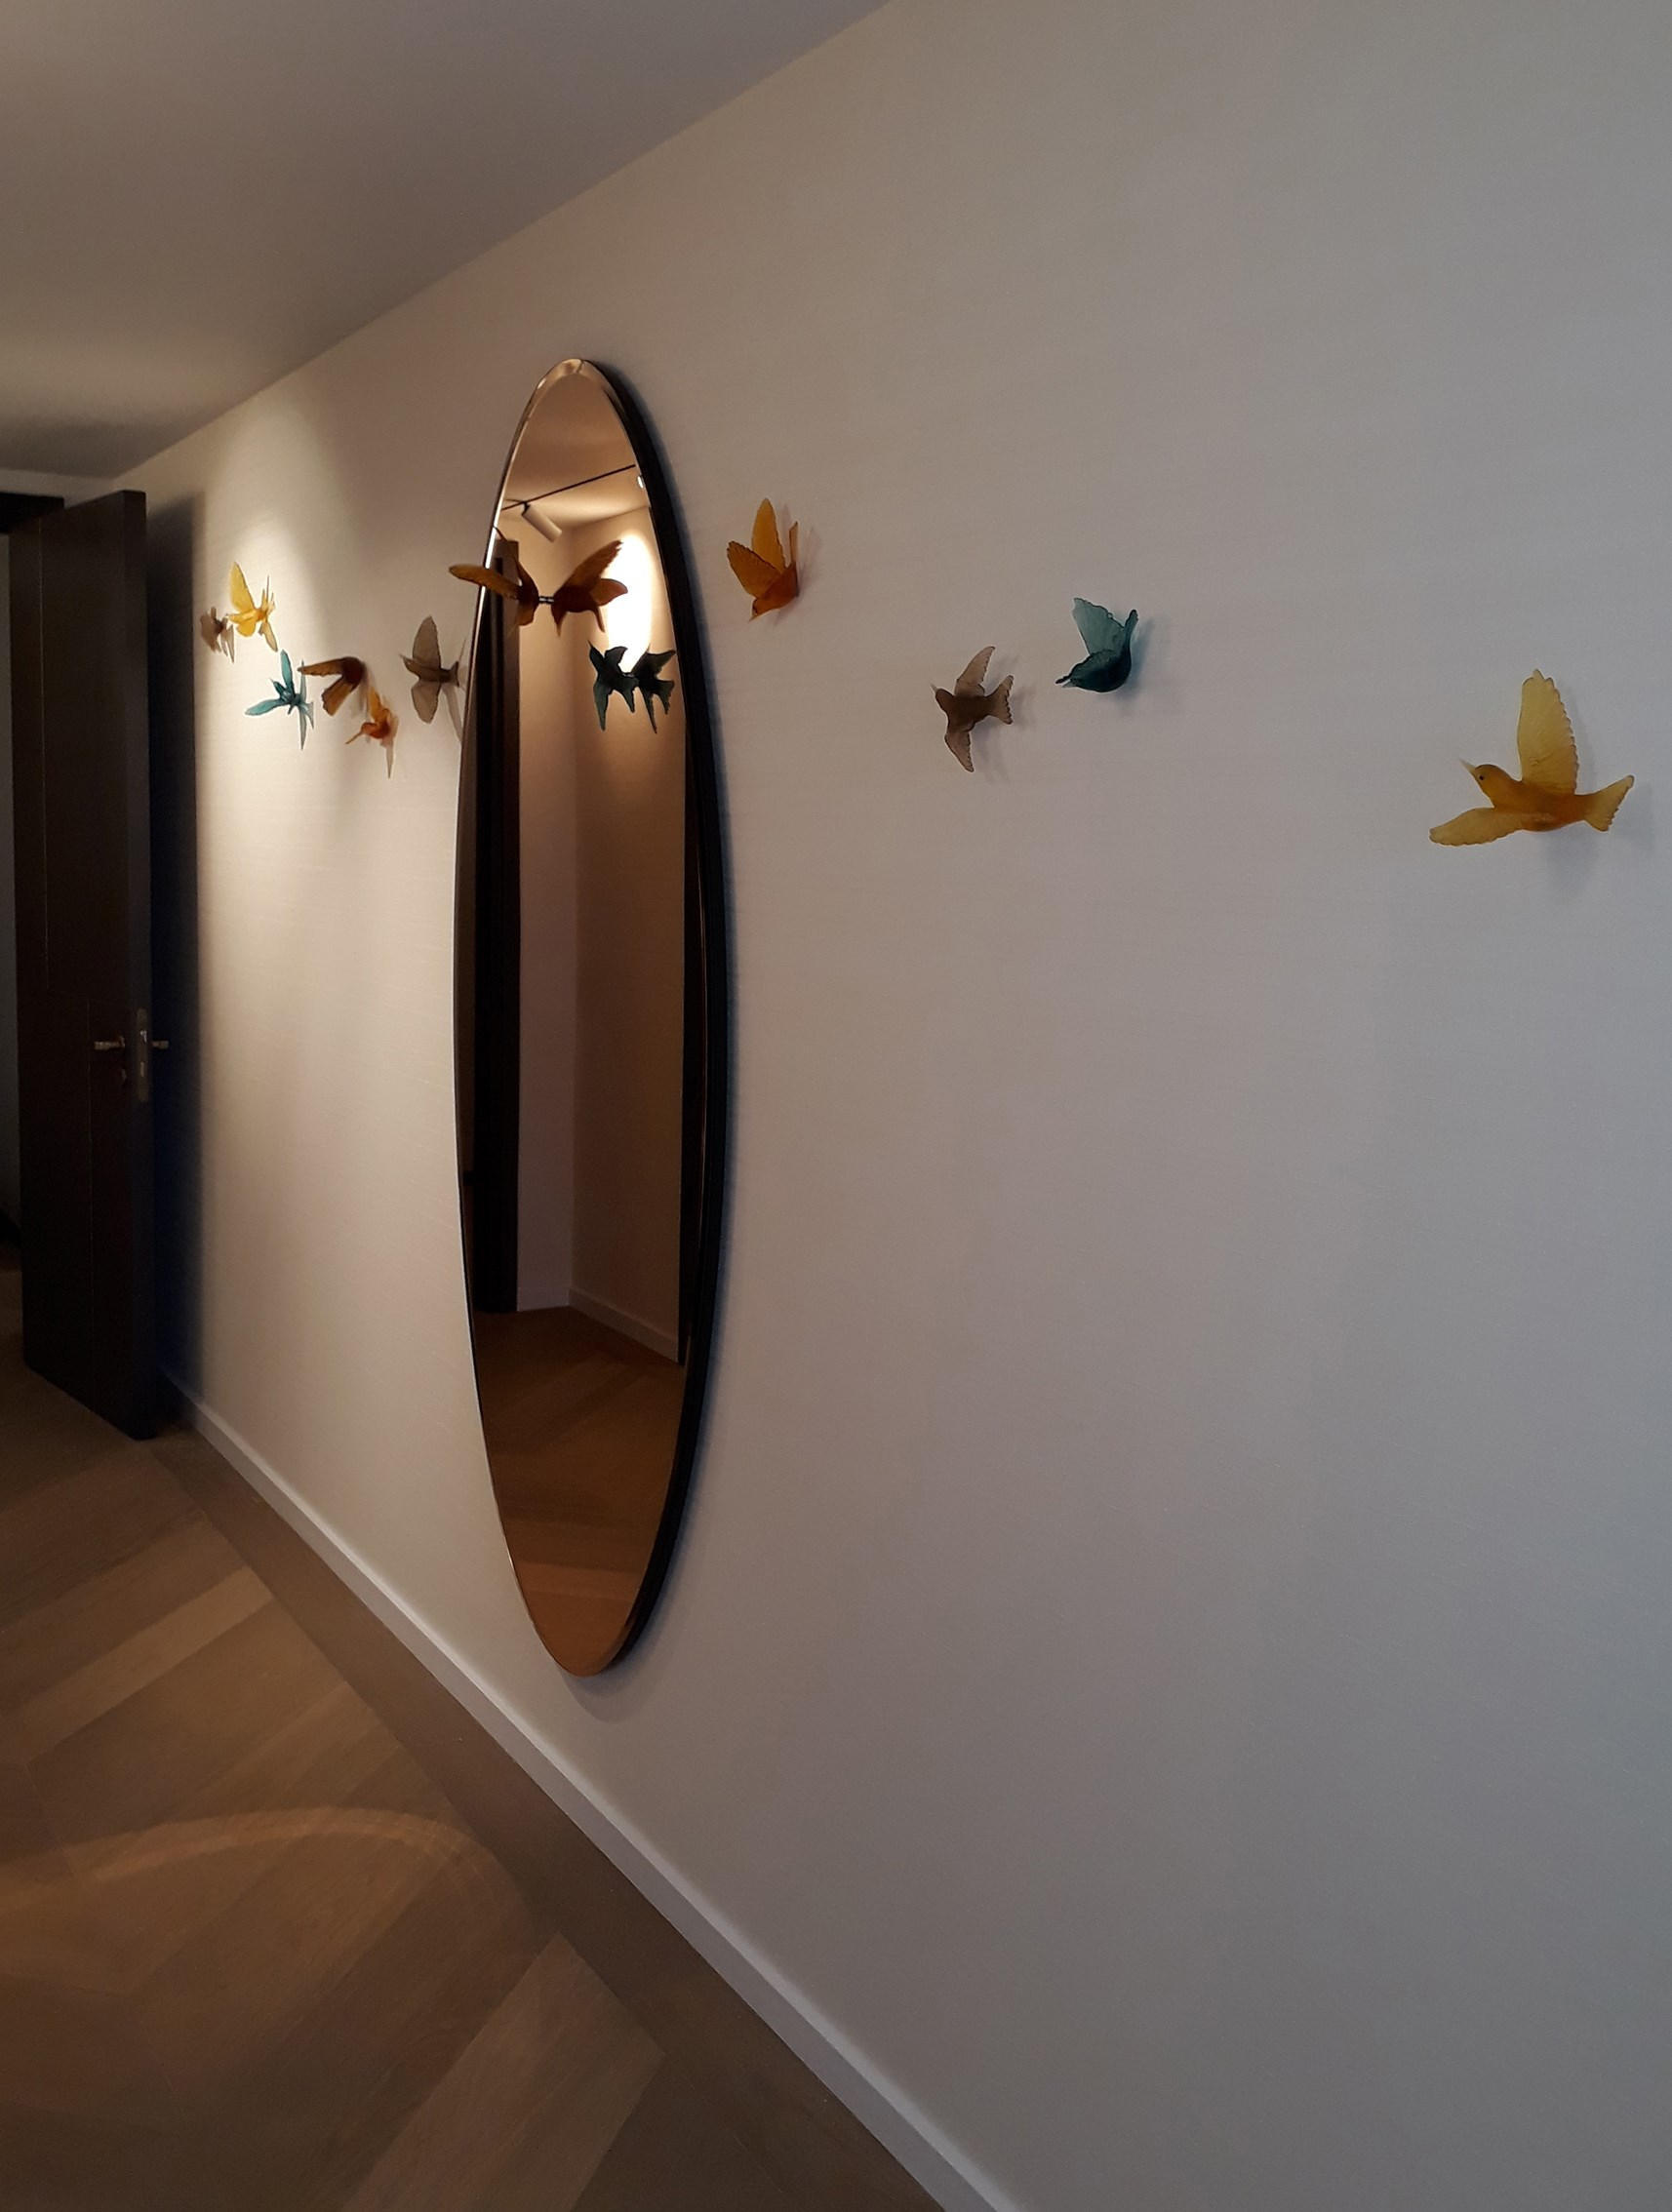 celestial mirror decorative mirror art with lukeke design birds at vessel gallery london